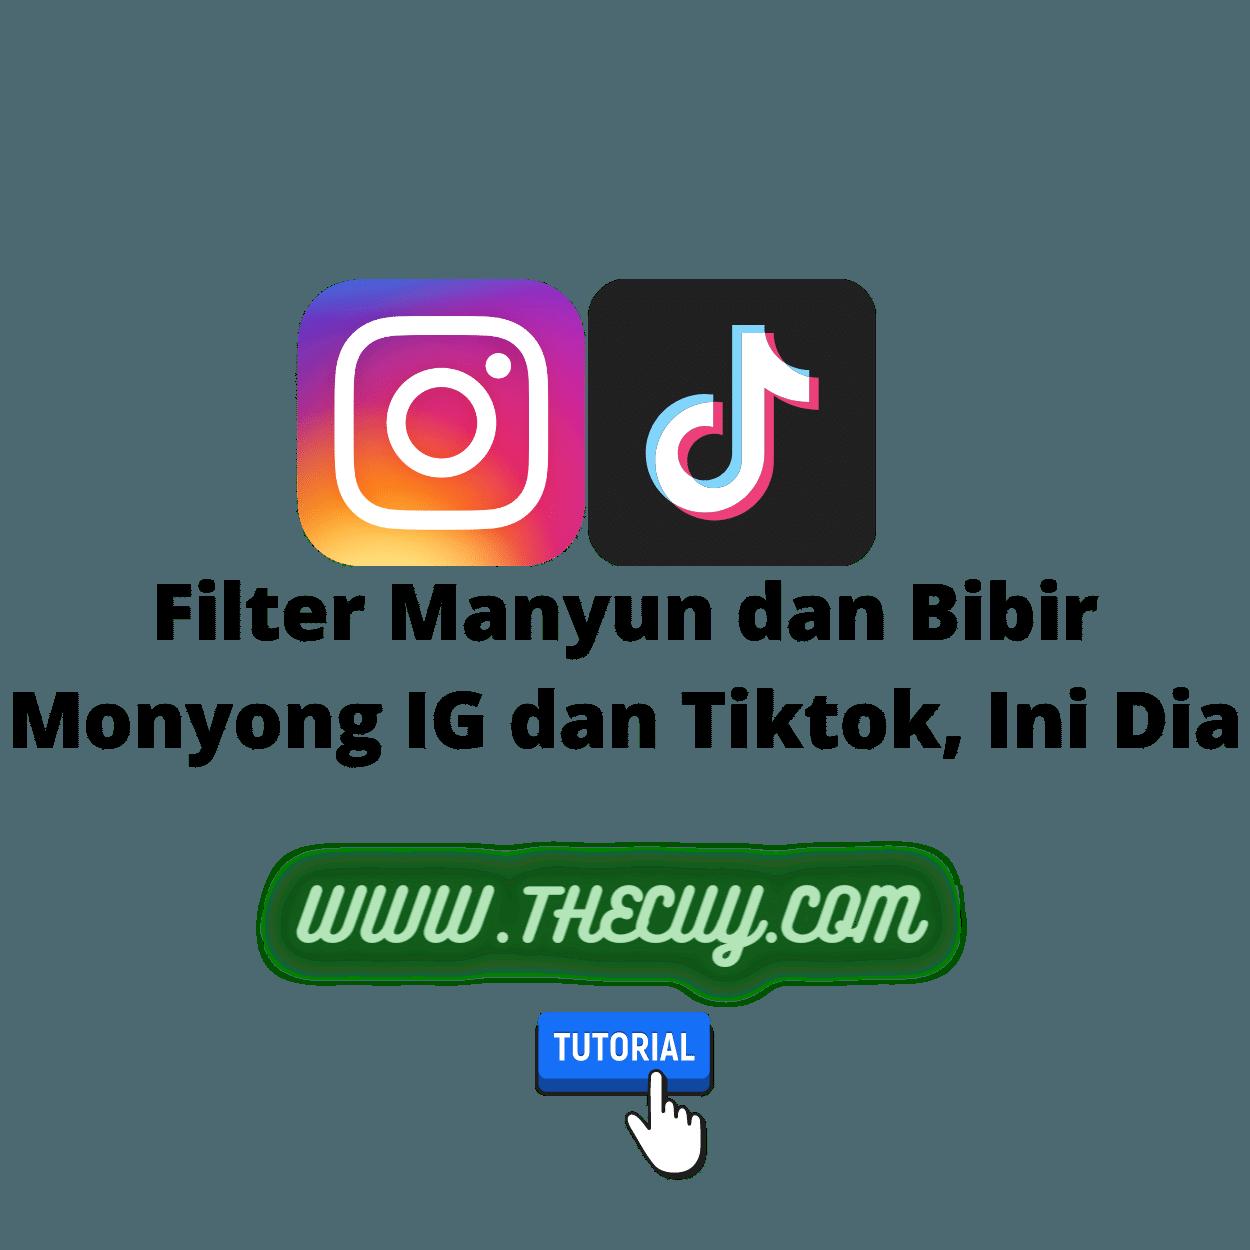 Filter Manyun dan Bibir Monyong IG dan Tiktok, Ini Dia